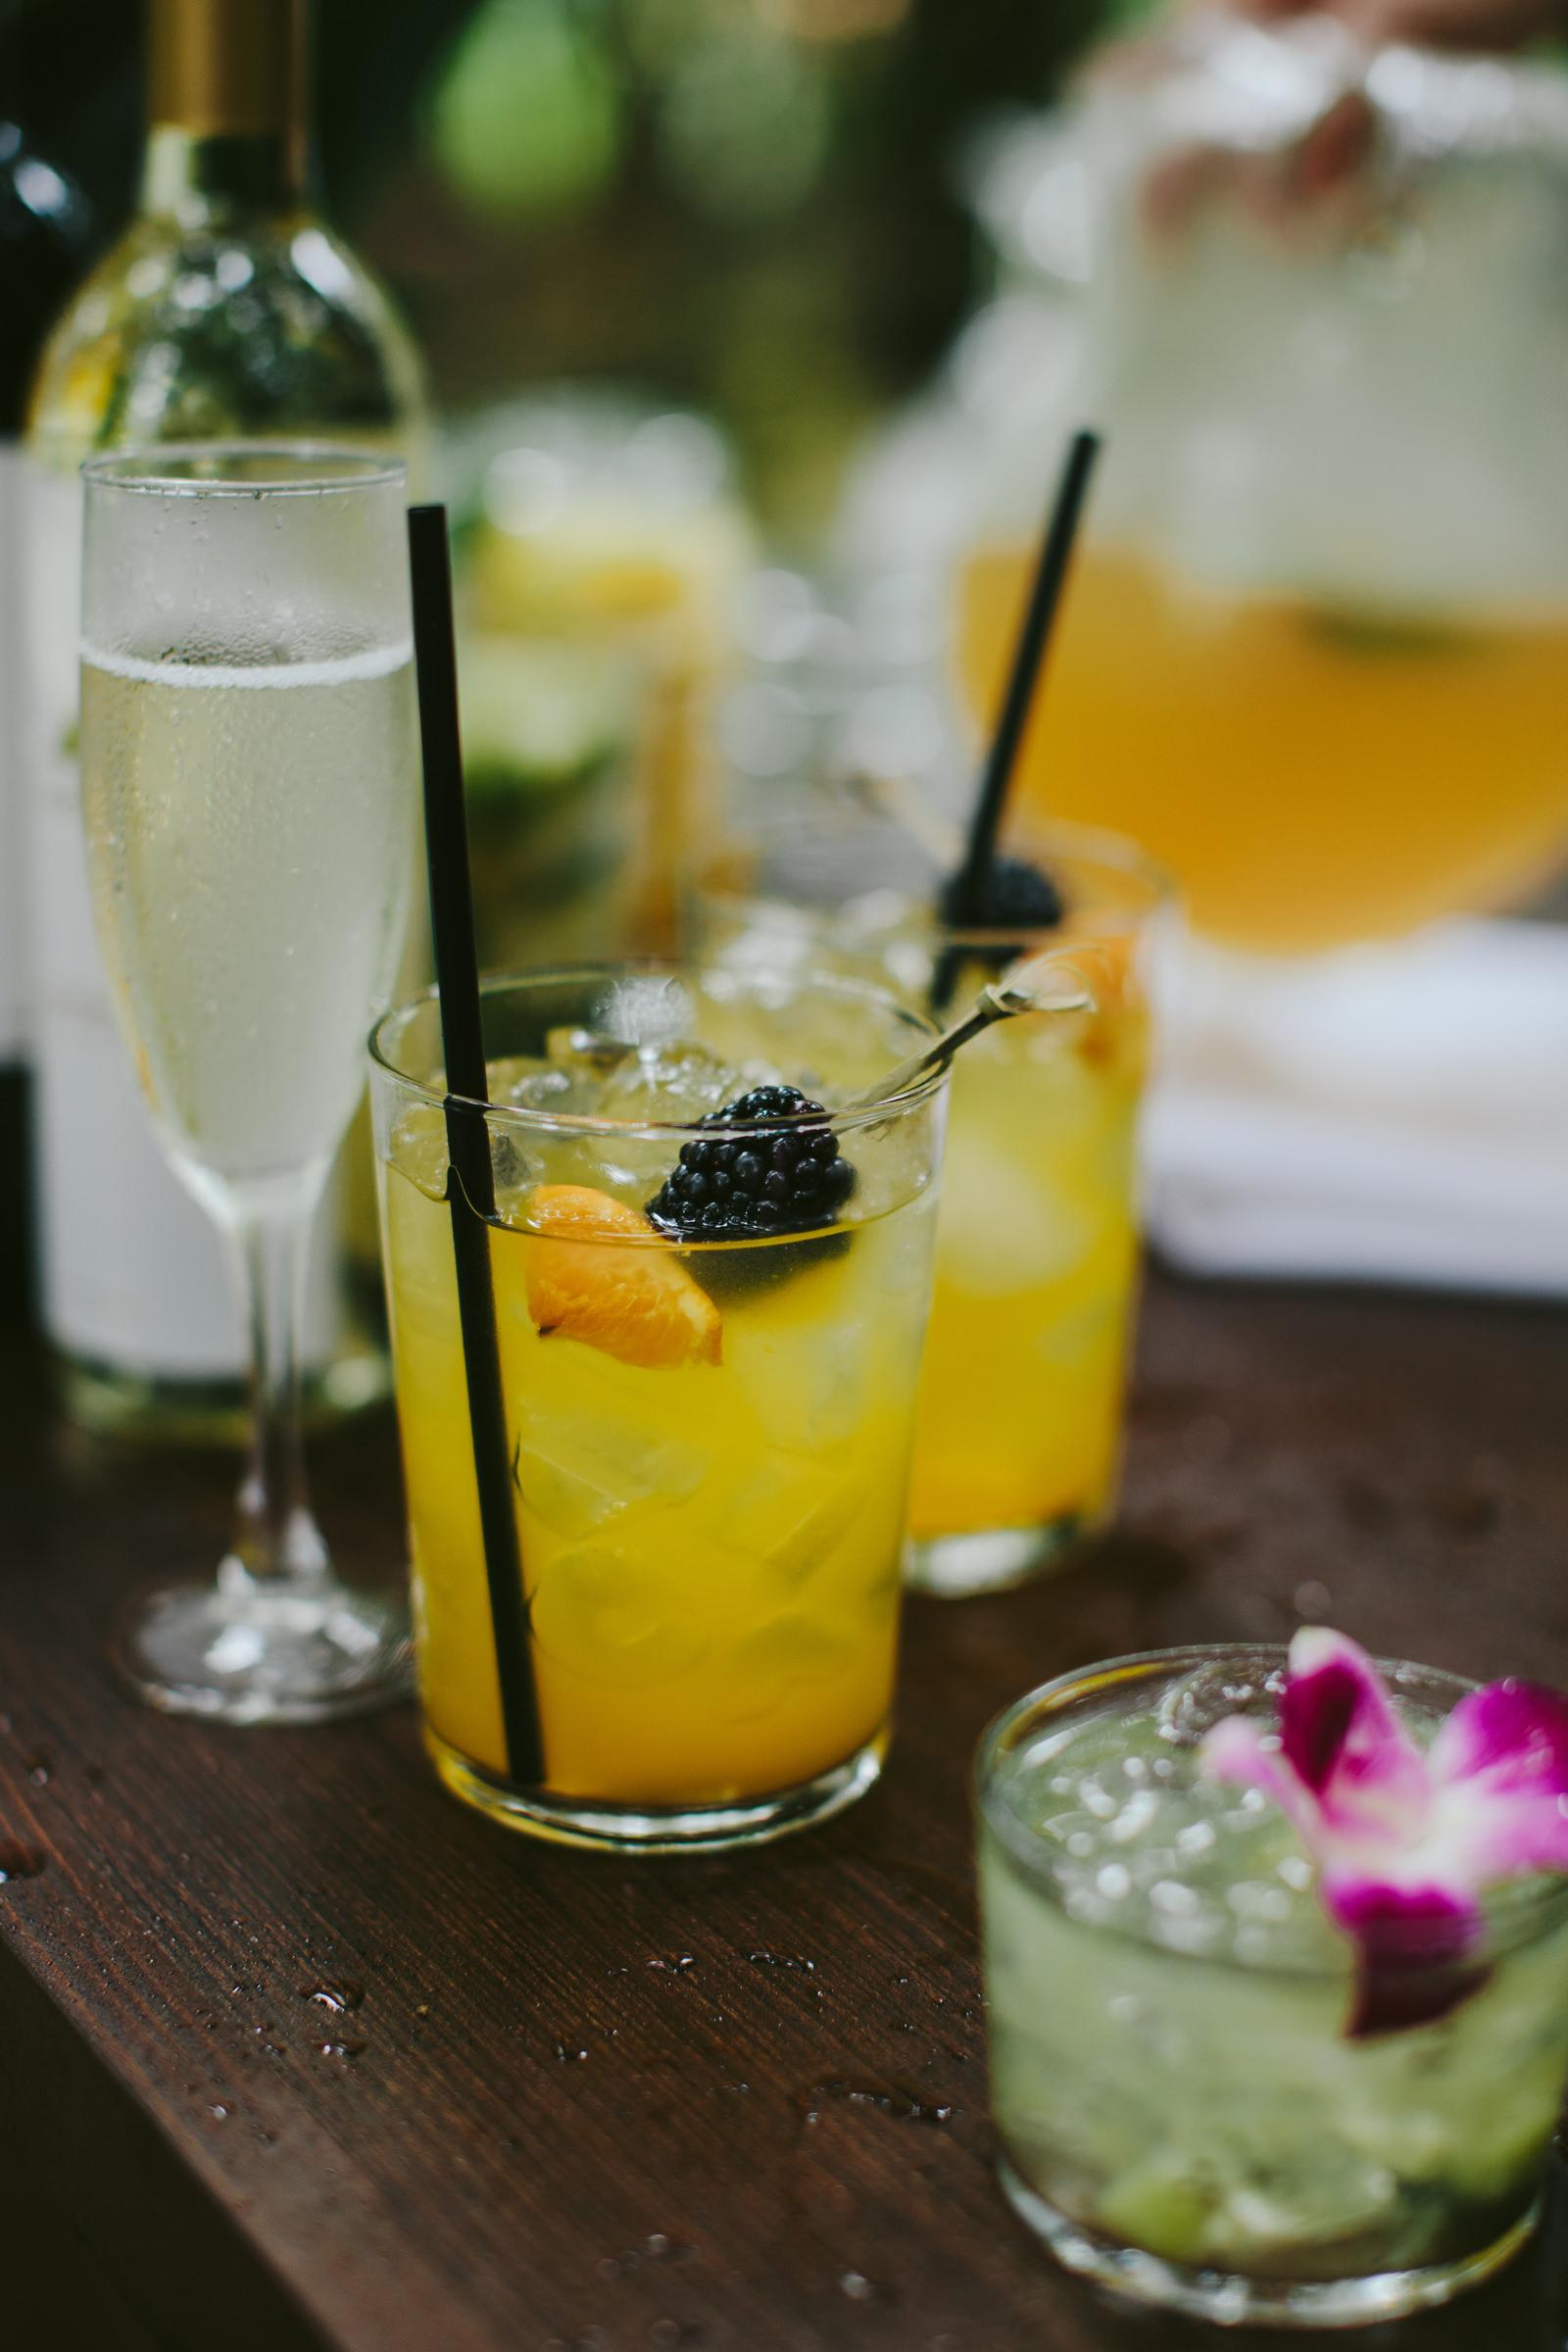 Tropical drinks at haiki mill maui - photo by Melia Lucida